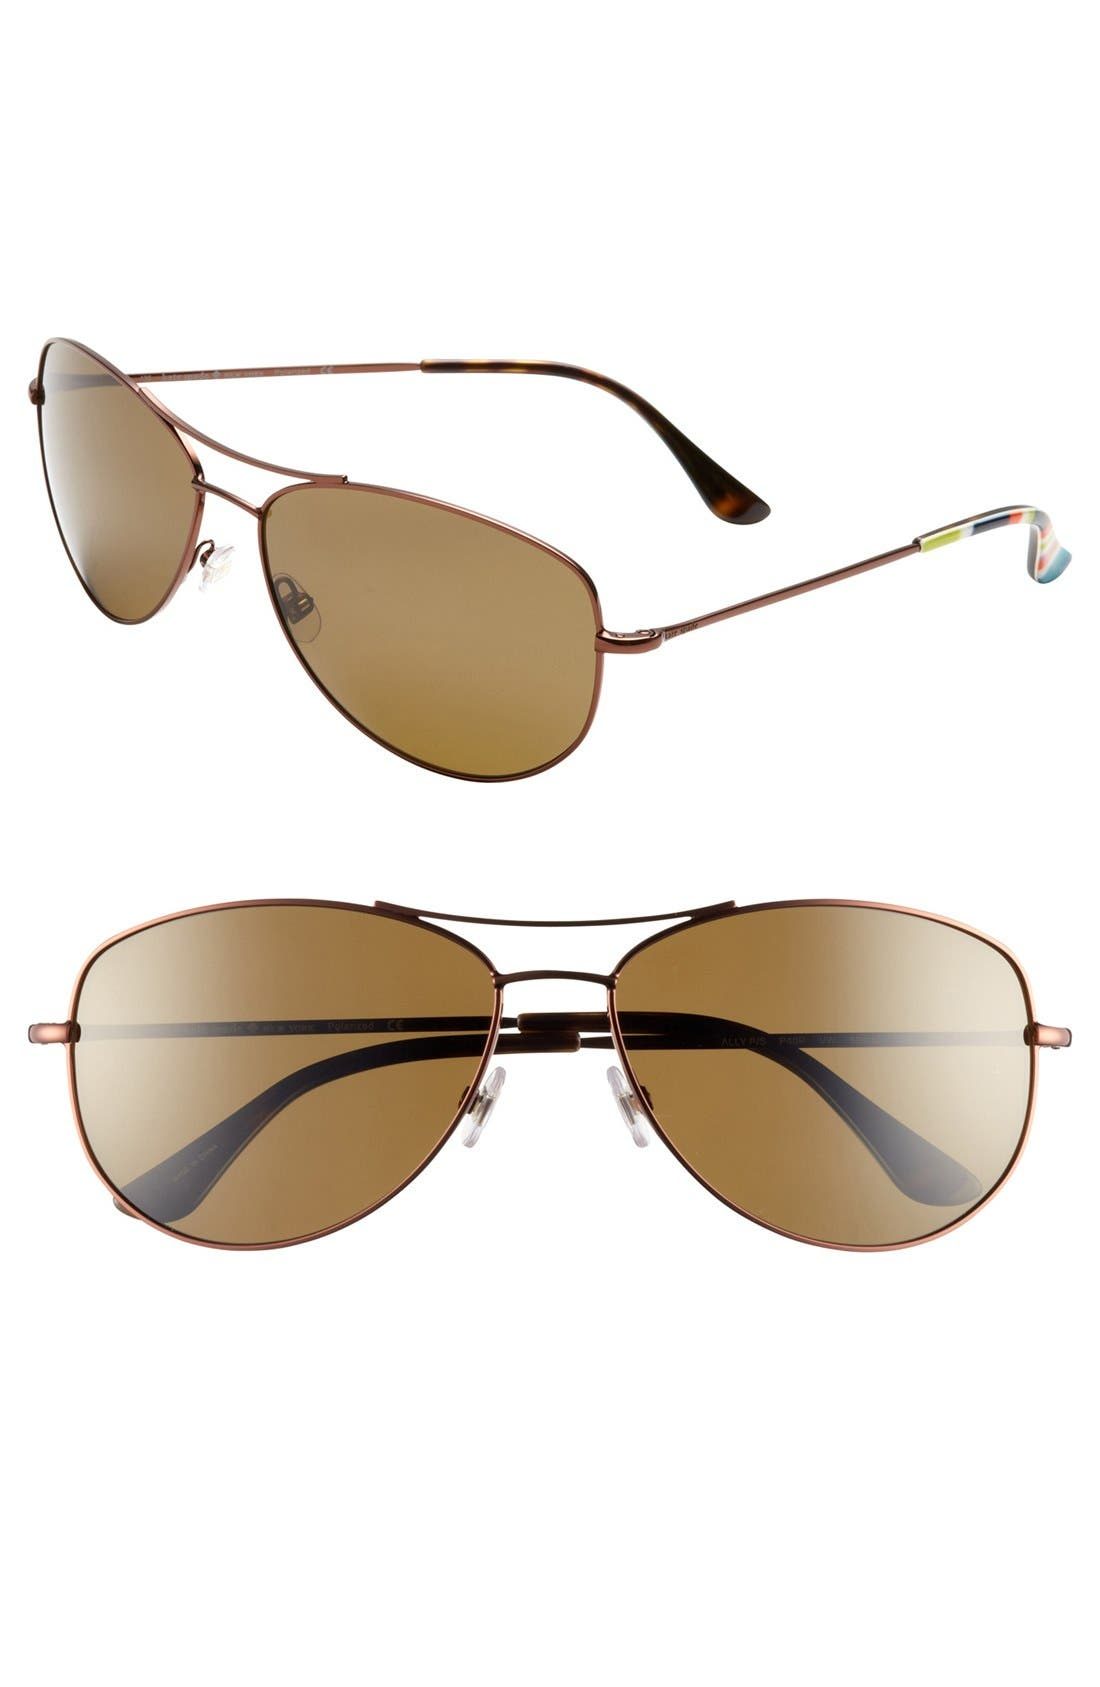 Alternate Image 1 Selected - kate spade new york 'ally' 60mm polarized metal aviator sunglasses